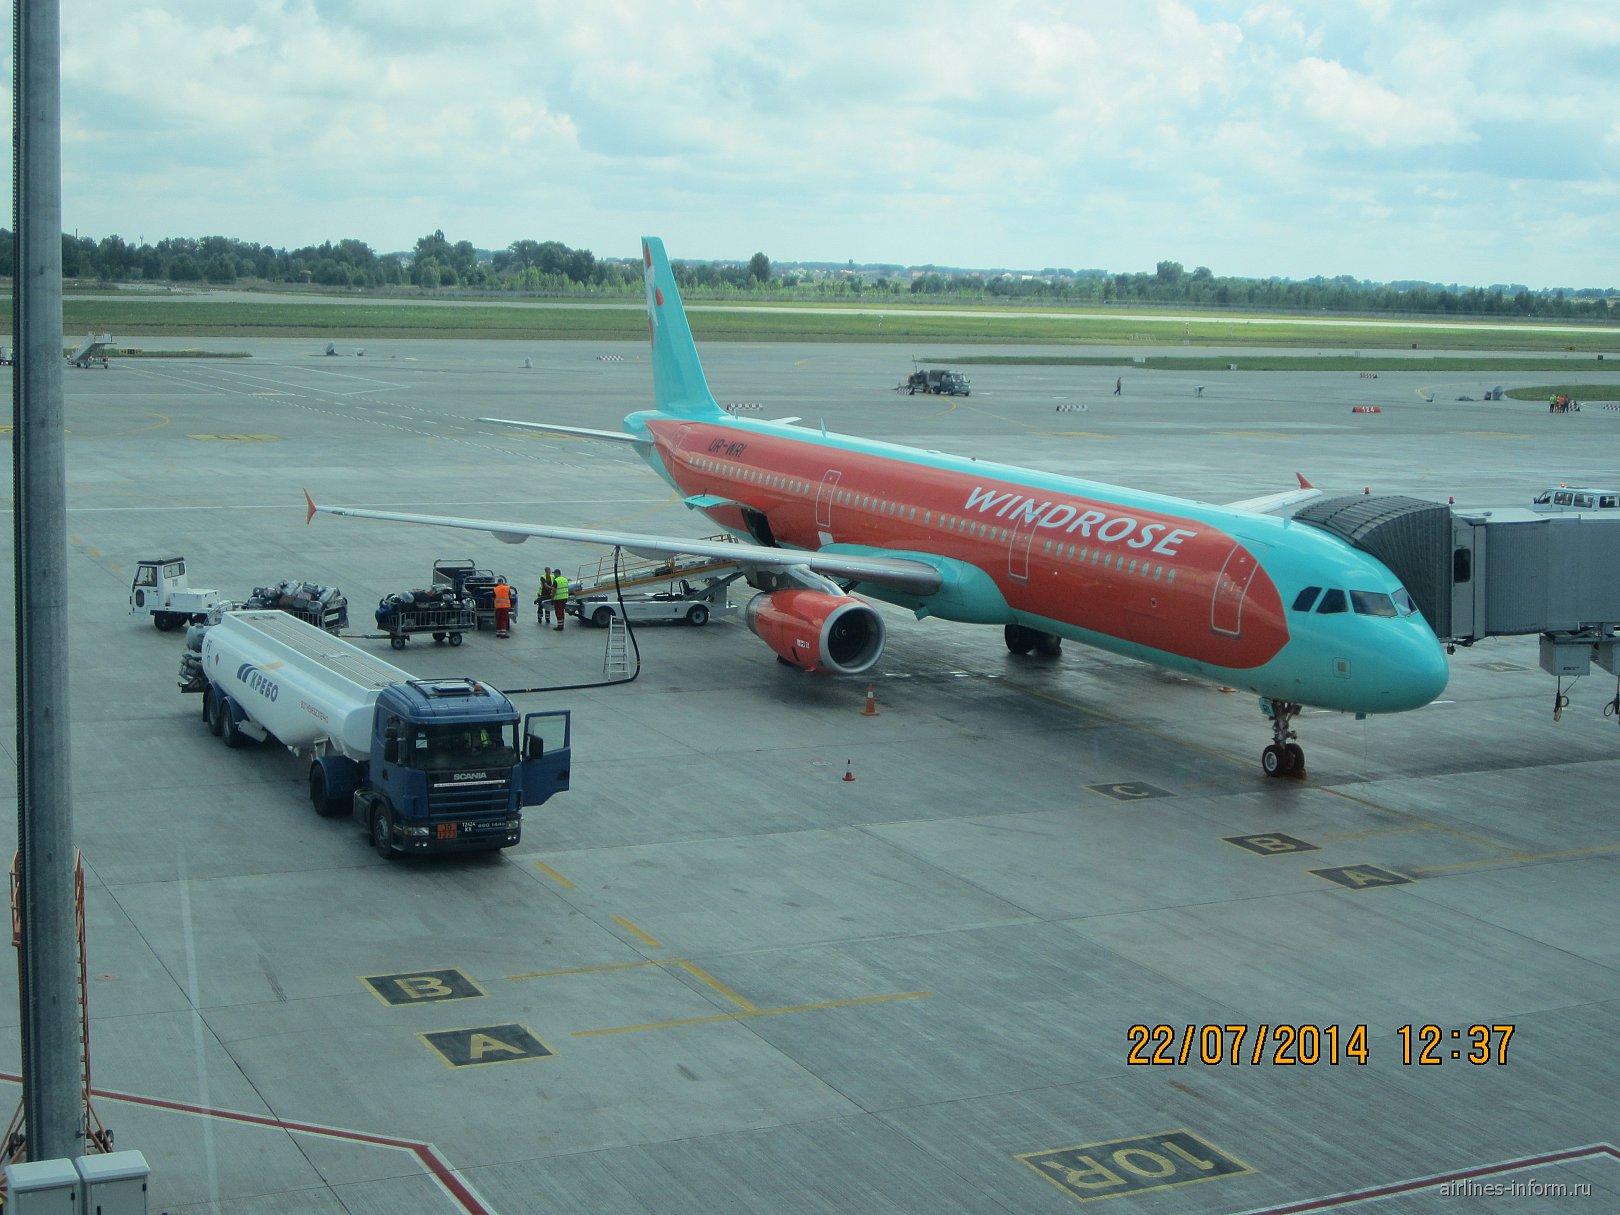 Airbus A321 авиакомпании Windrose в аэропорту Борисполь